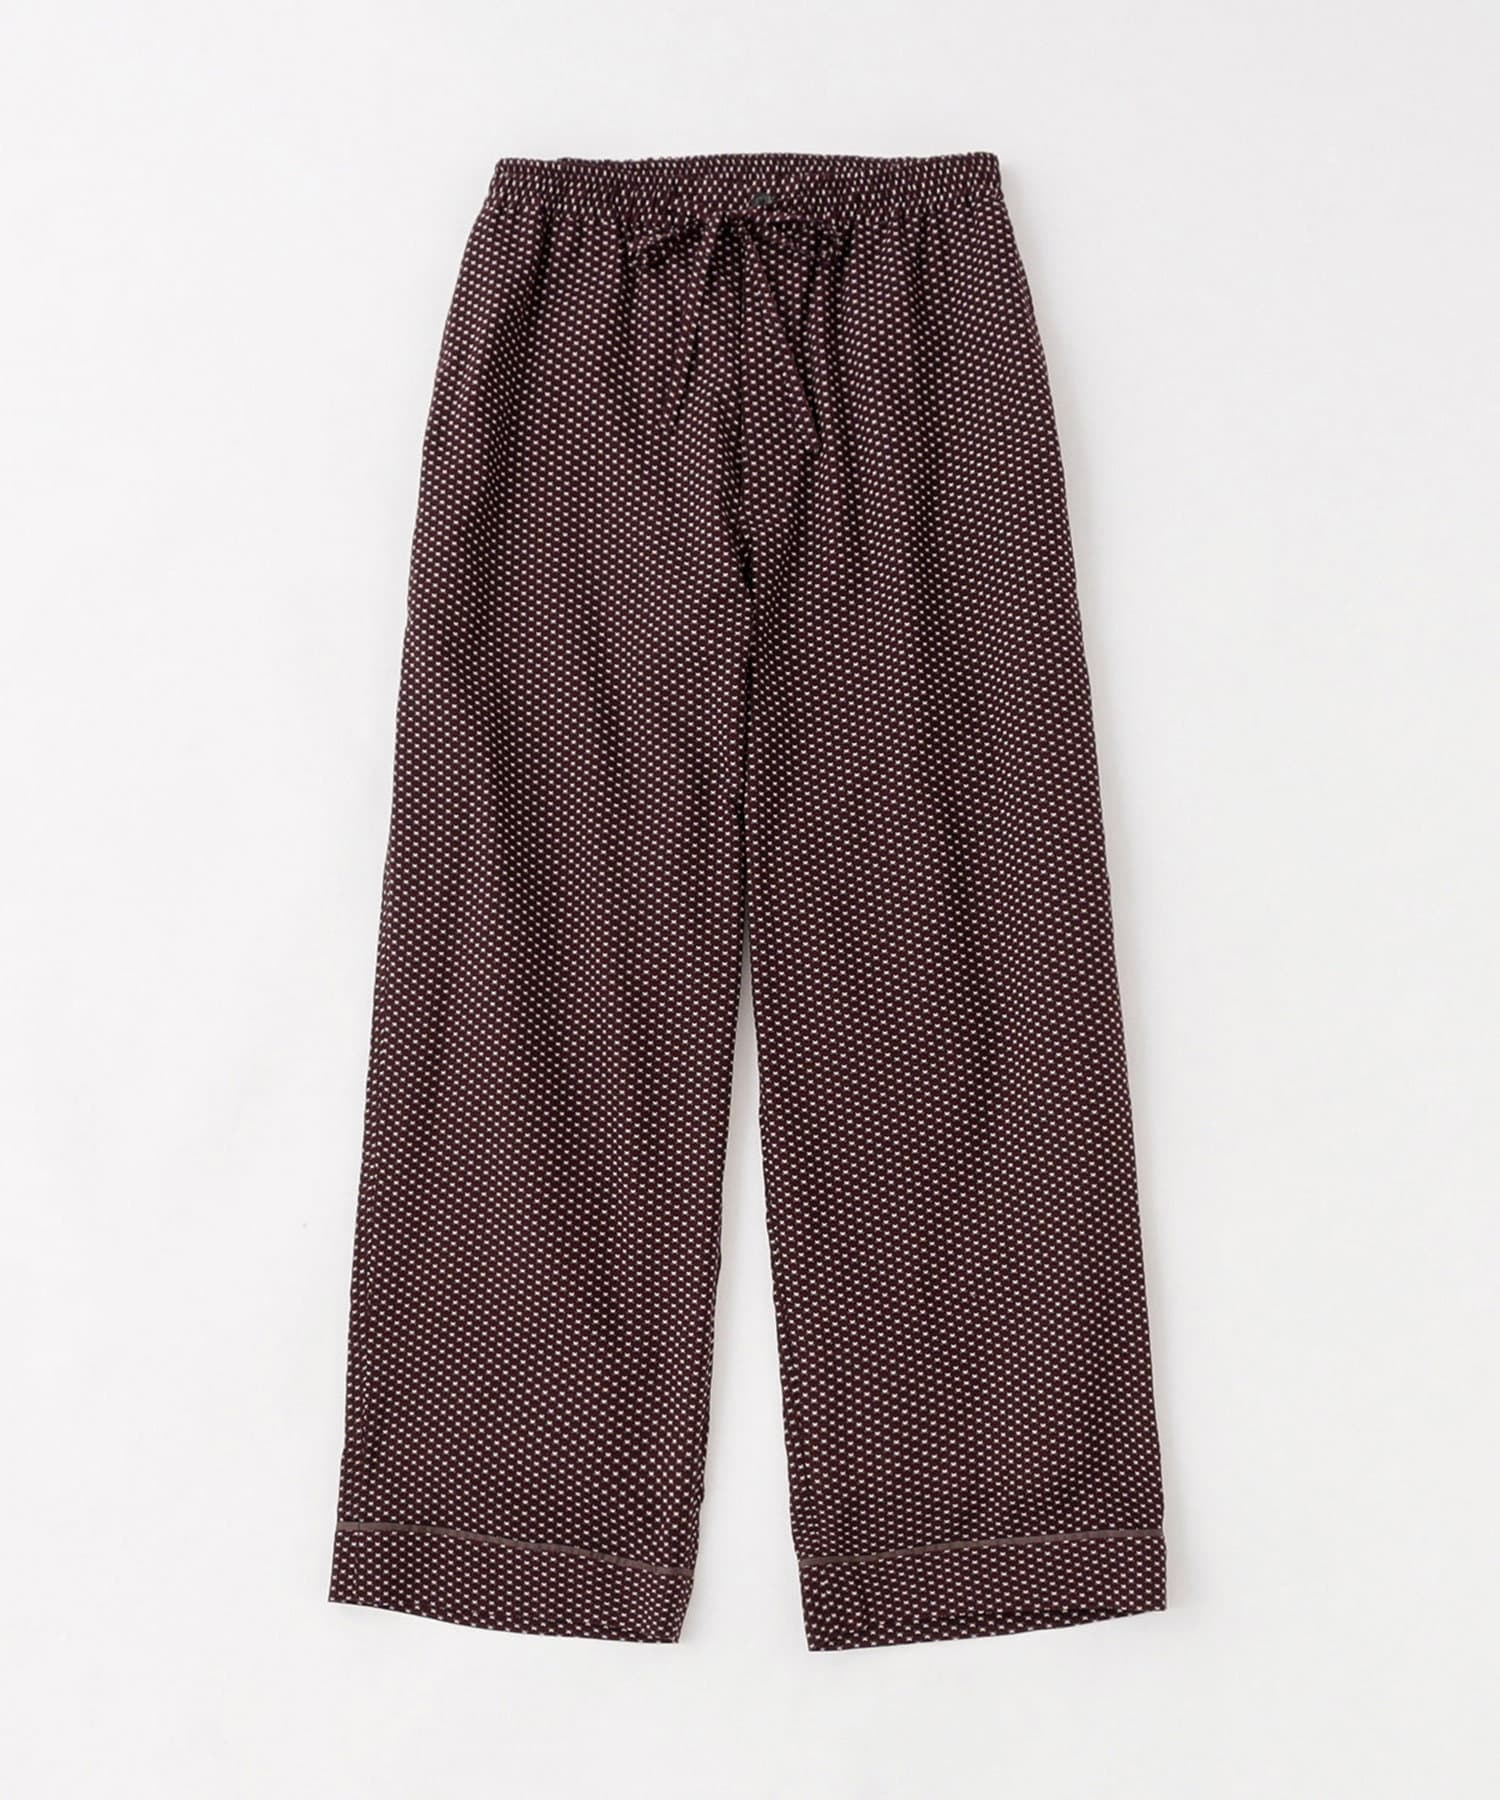 BLOOM&BRANCH(ブルームアンドブランチ) Phlannèl / Komon Pajamas Pants